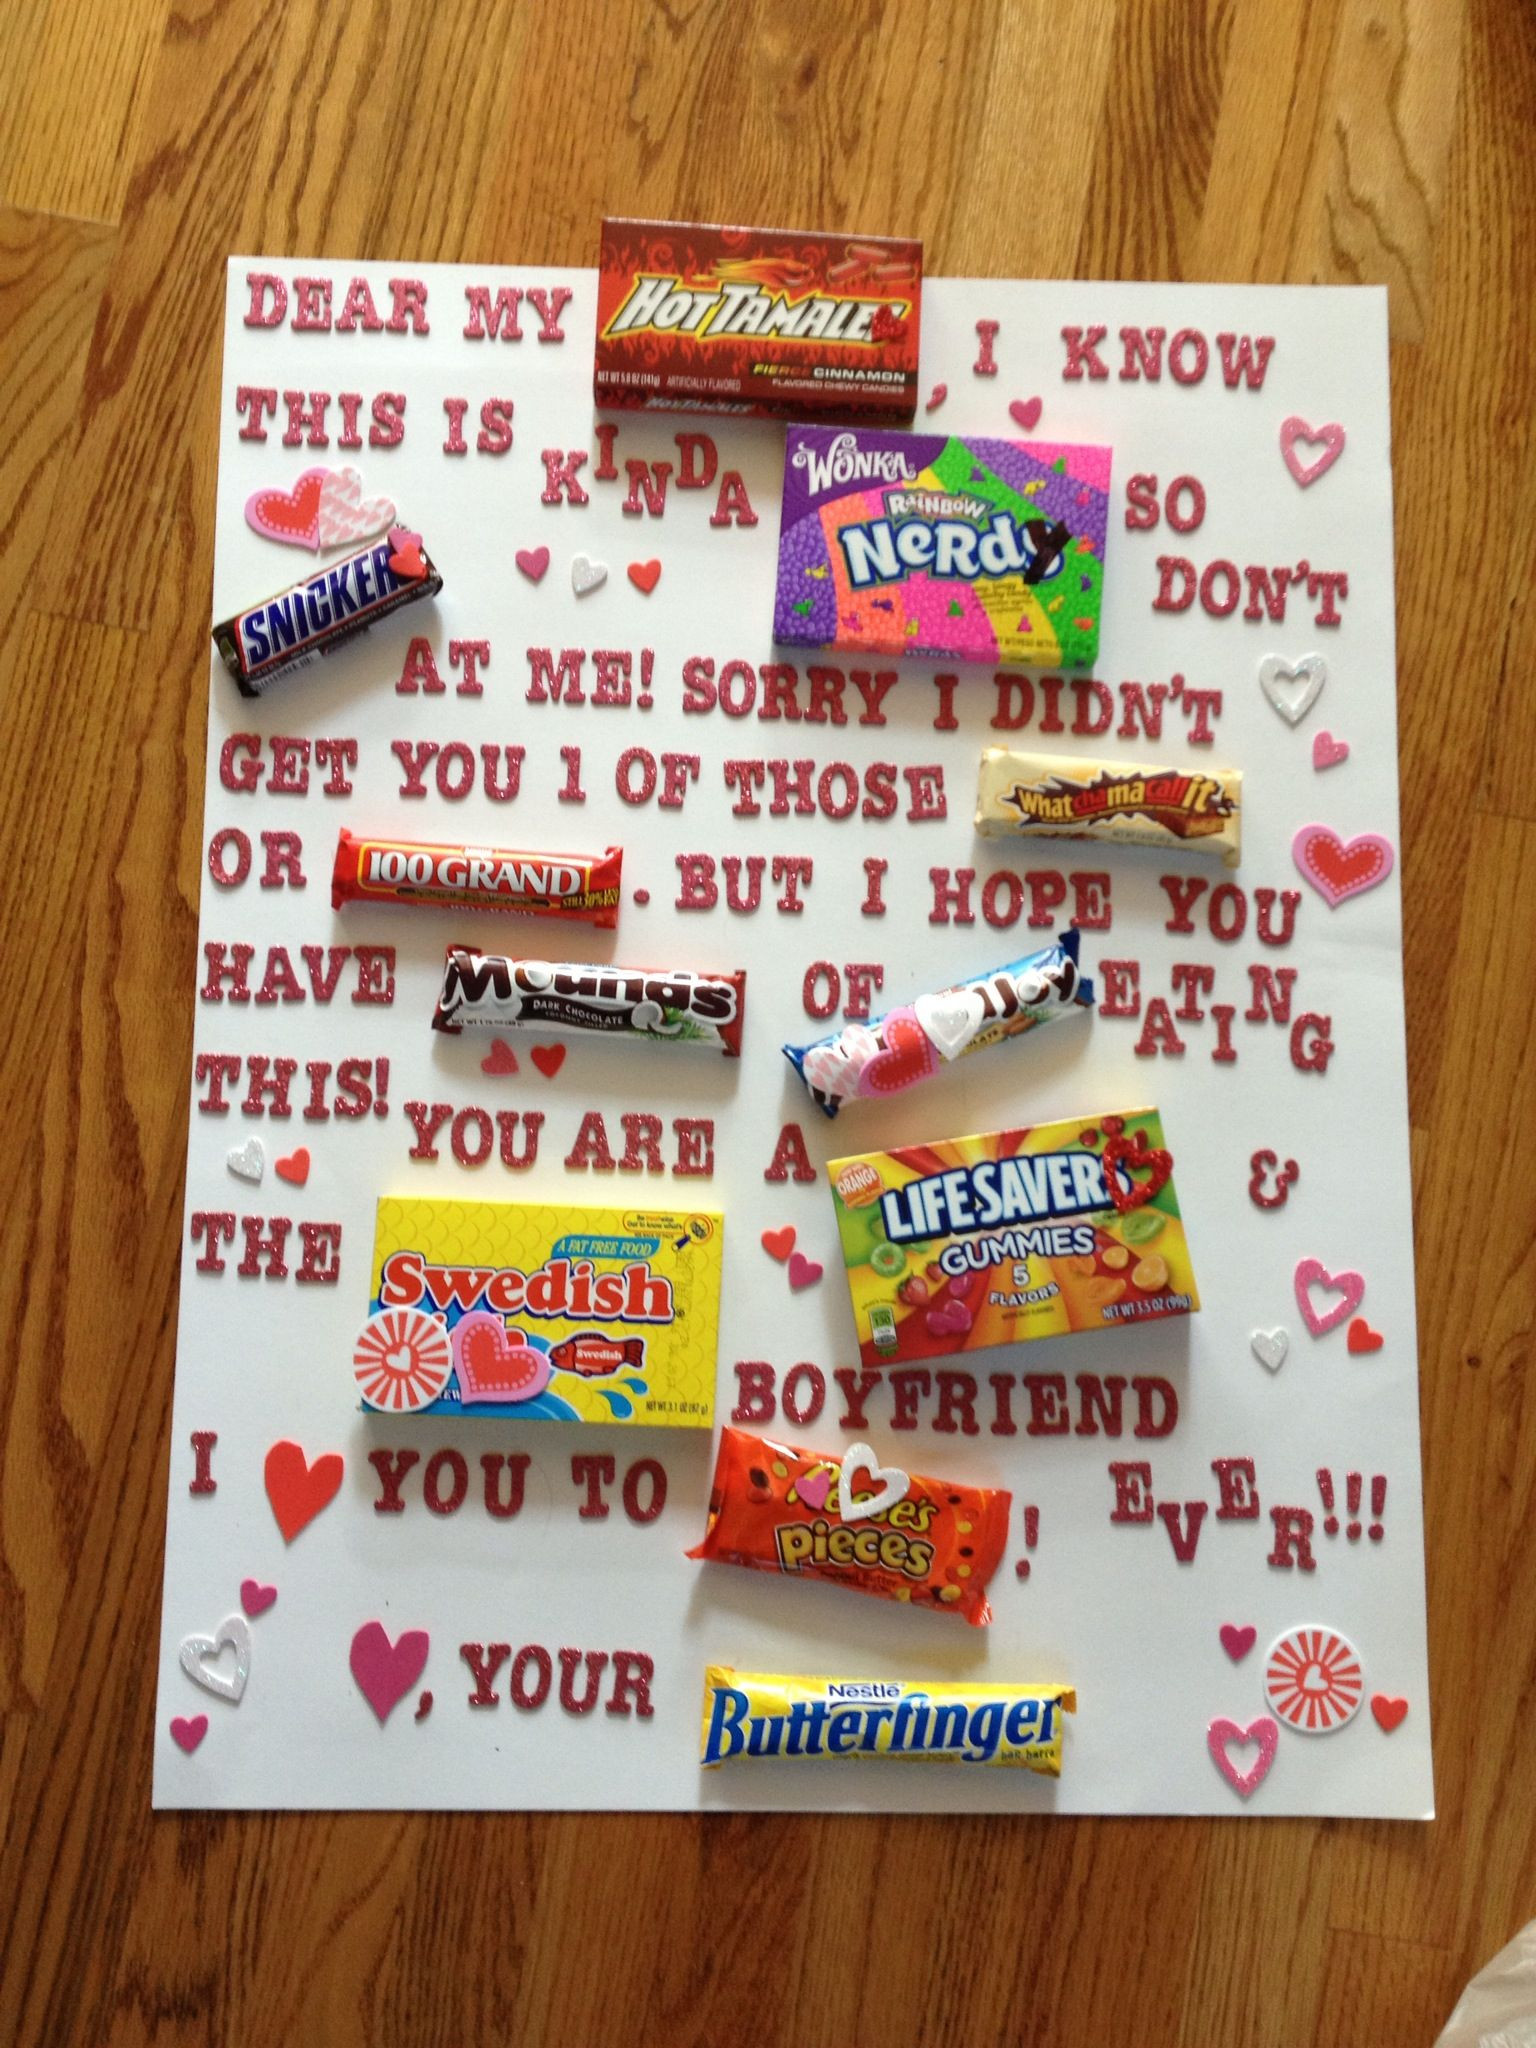 Valentines Gift Ideas For Your Boyfriend  What I made my boyfriend for Valentines day